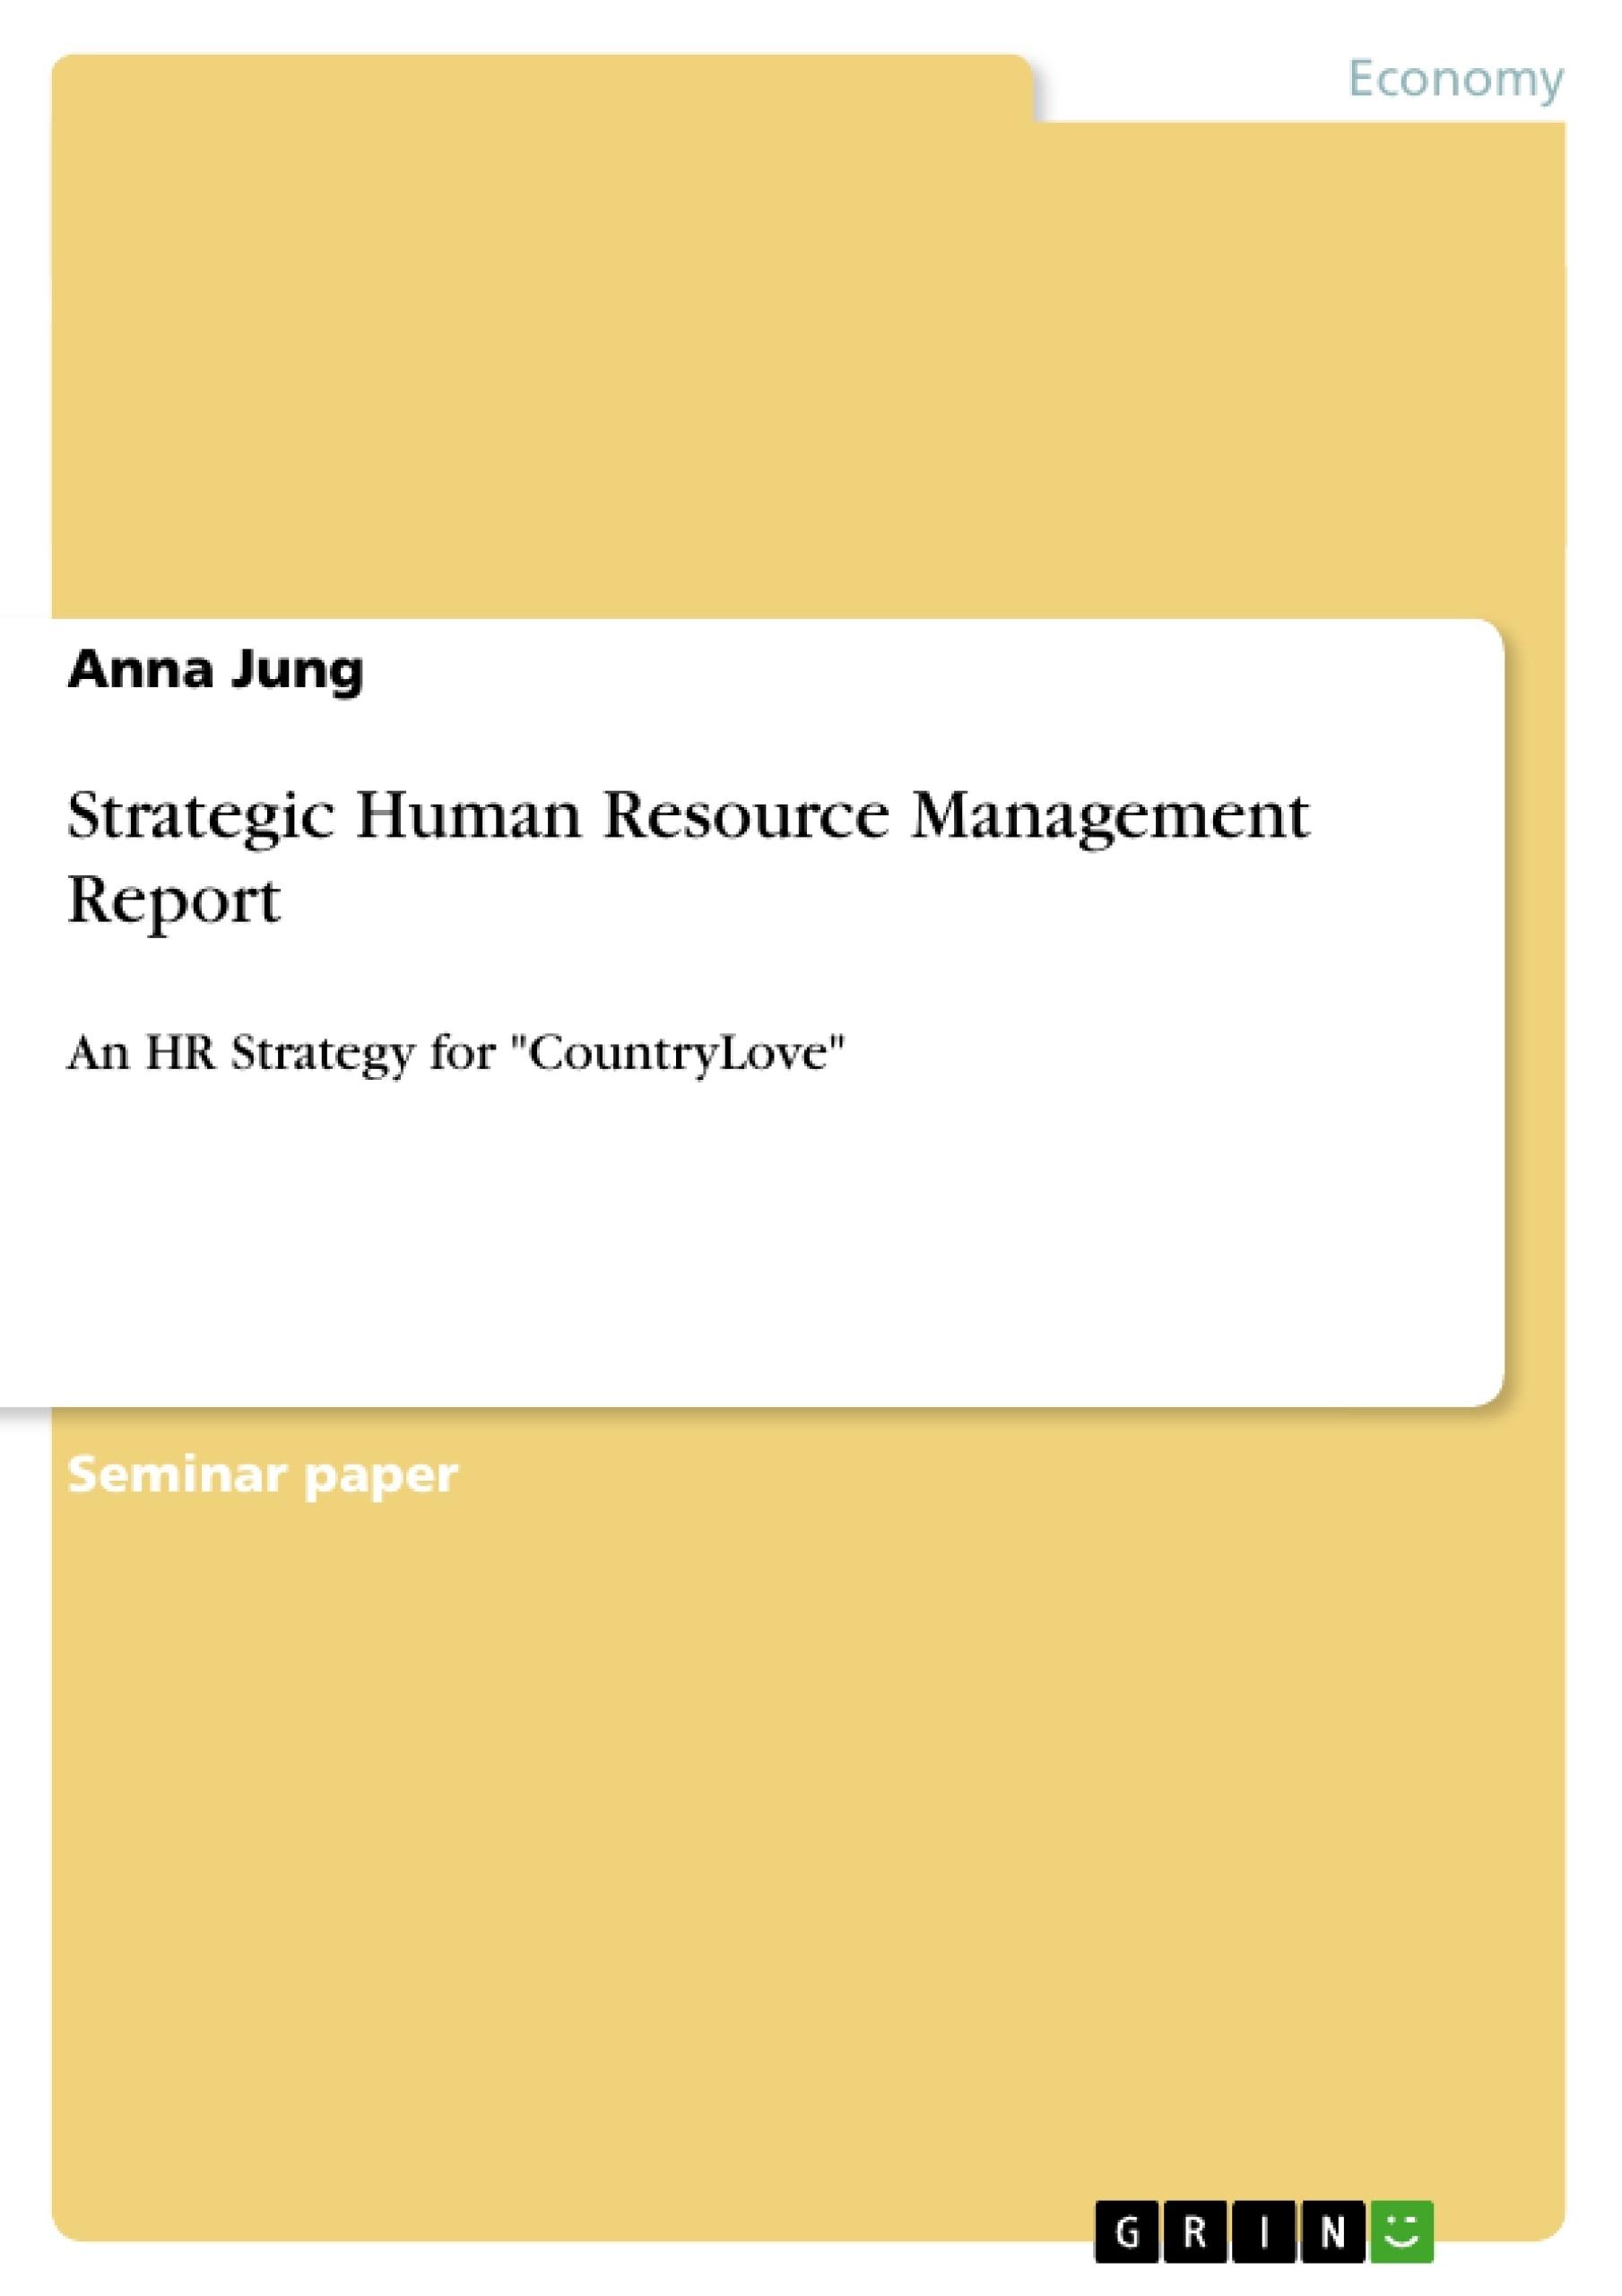 Title: Strategic Human Resource Management Report